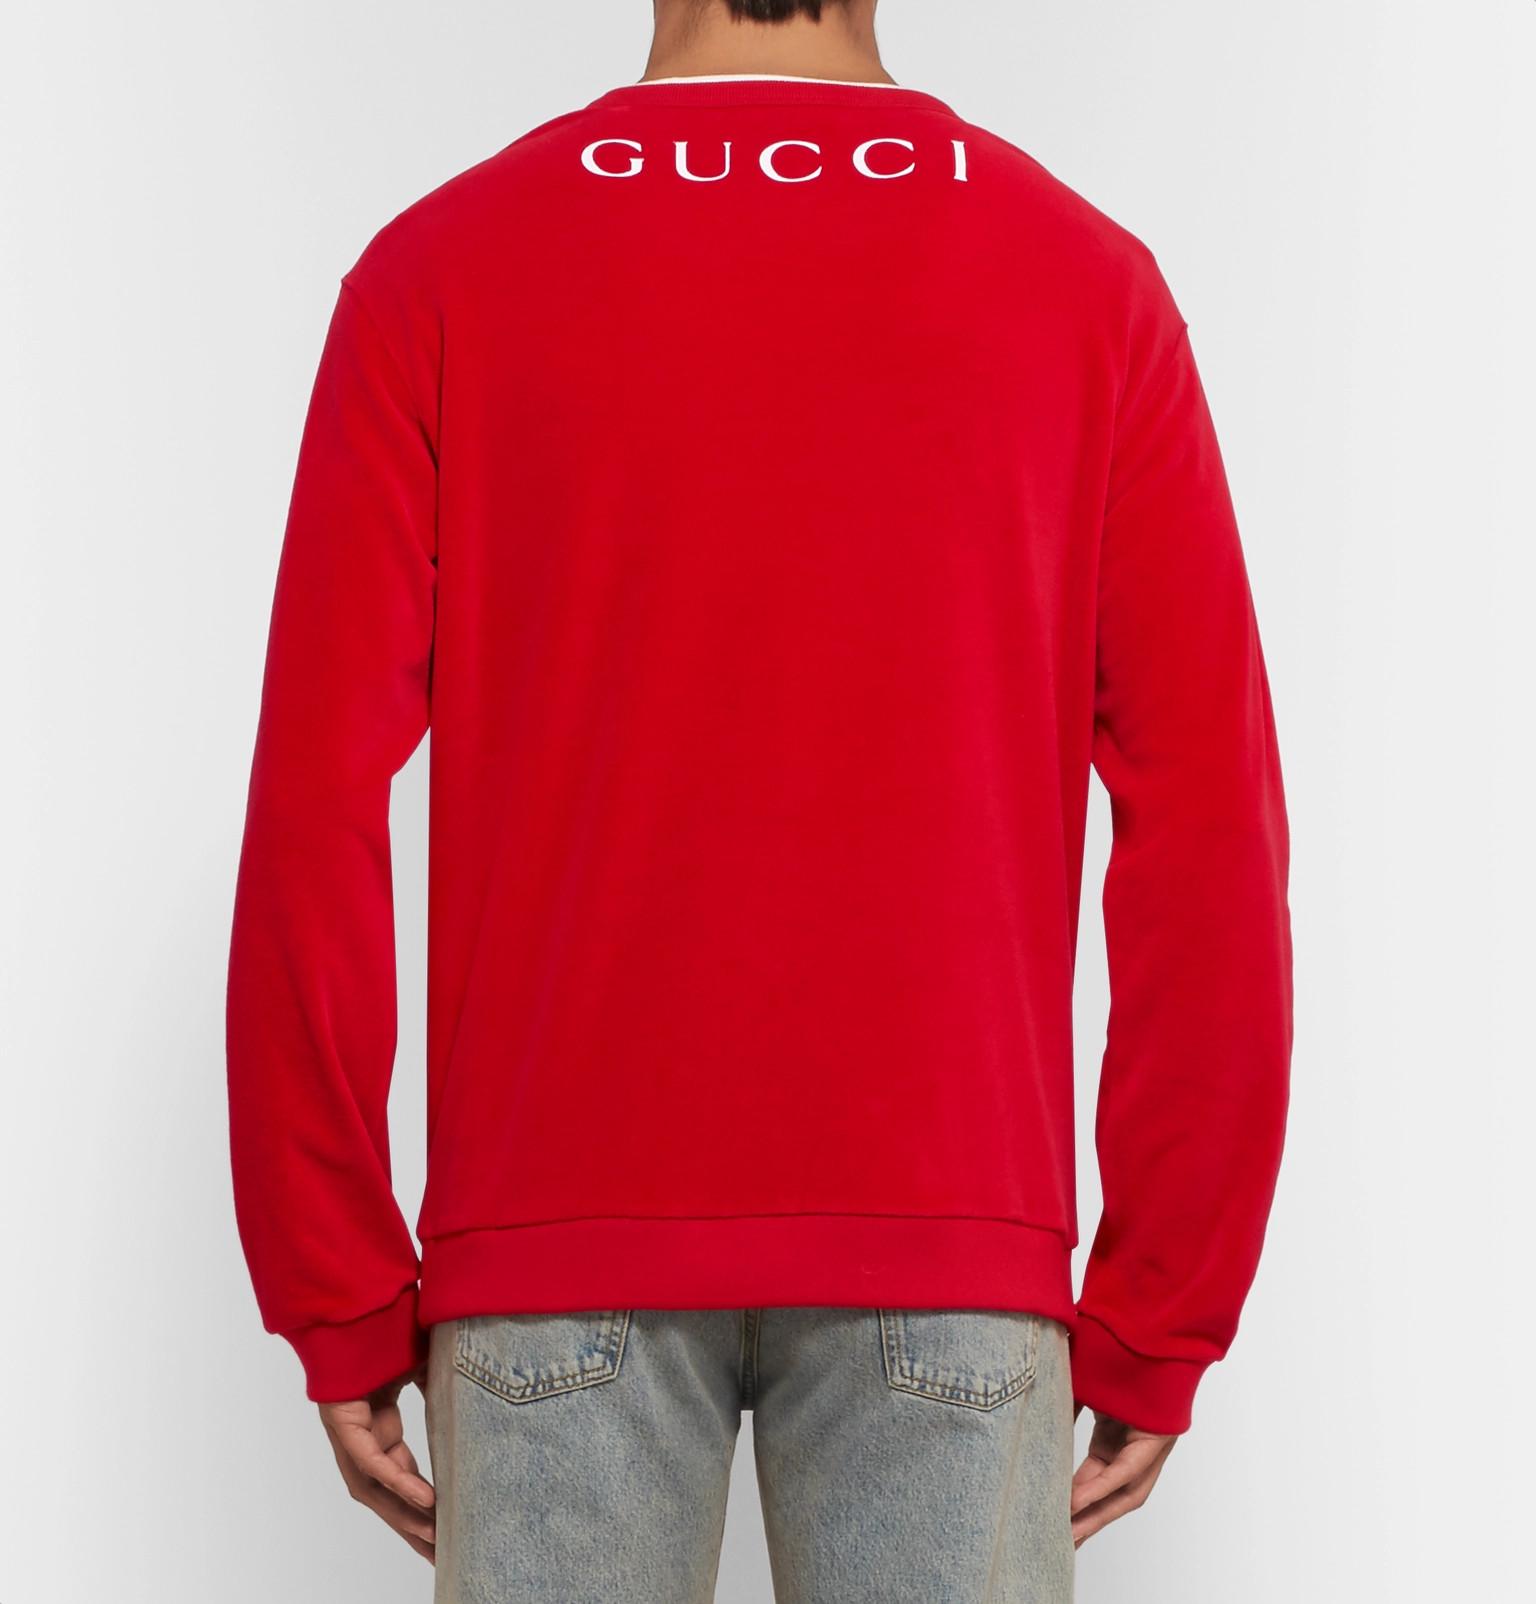 cf4827e2 Gucci - Printed Cotton-Blend Velvet Sweatshirt